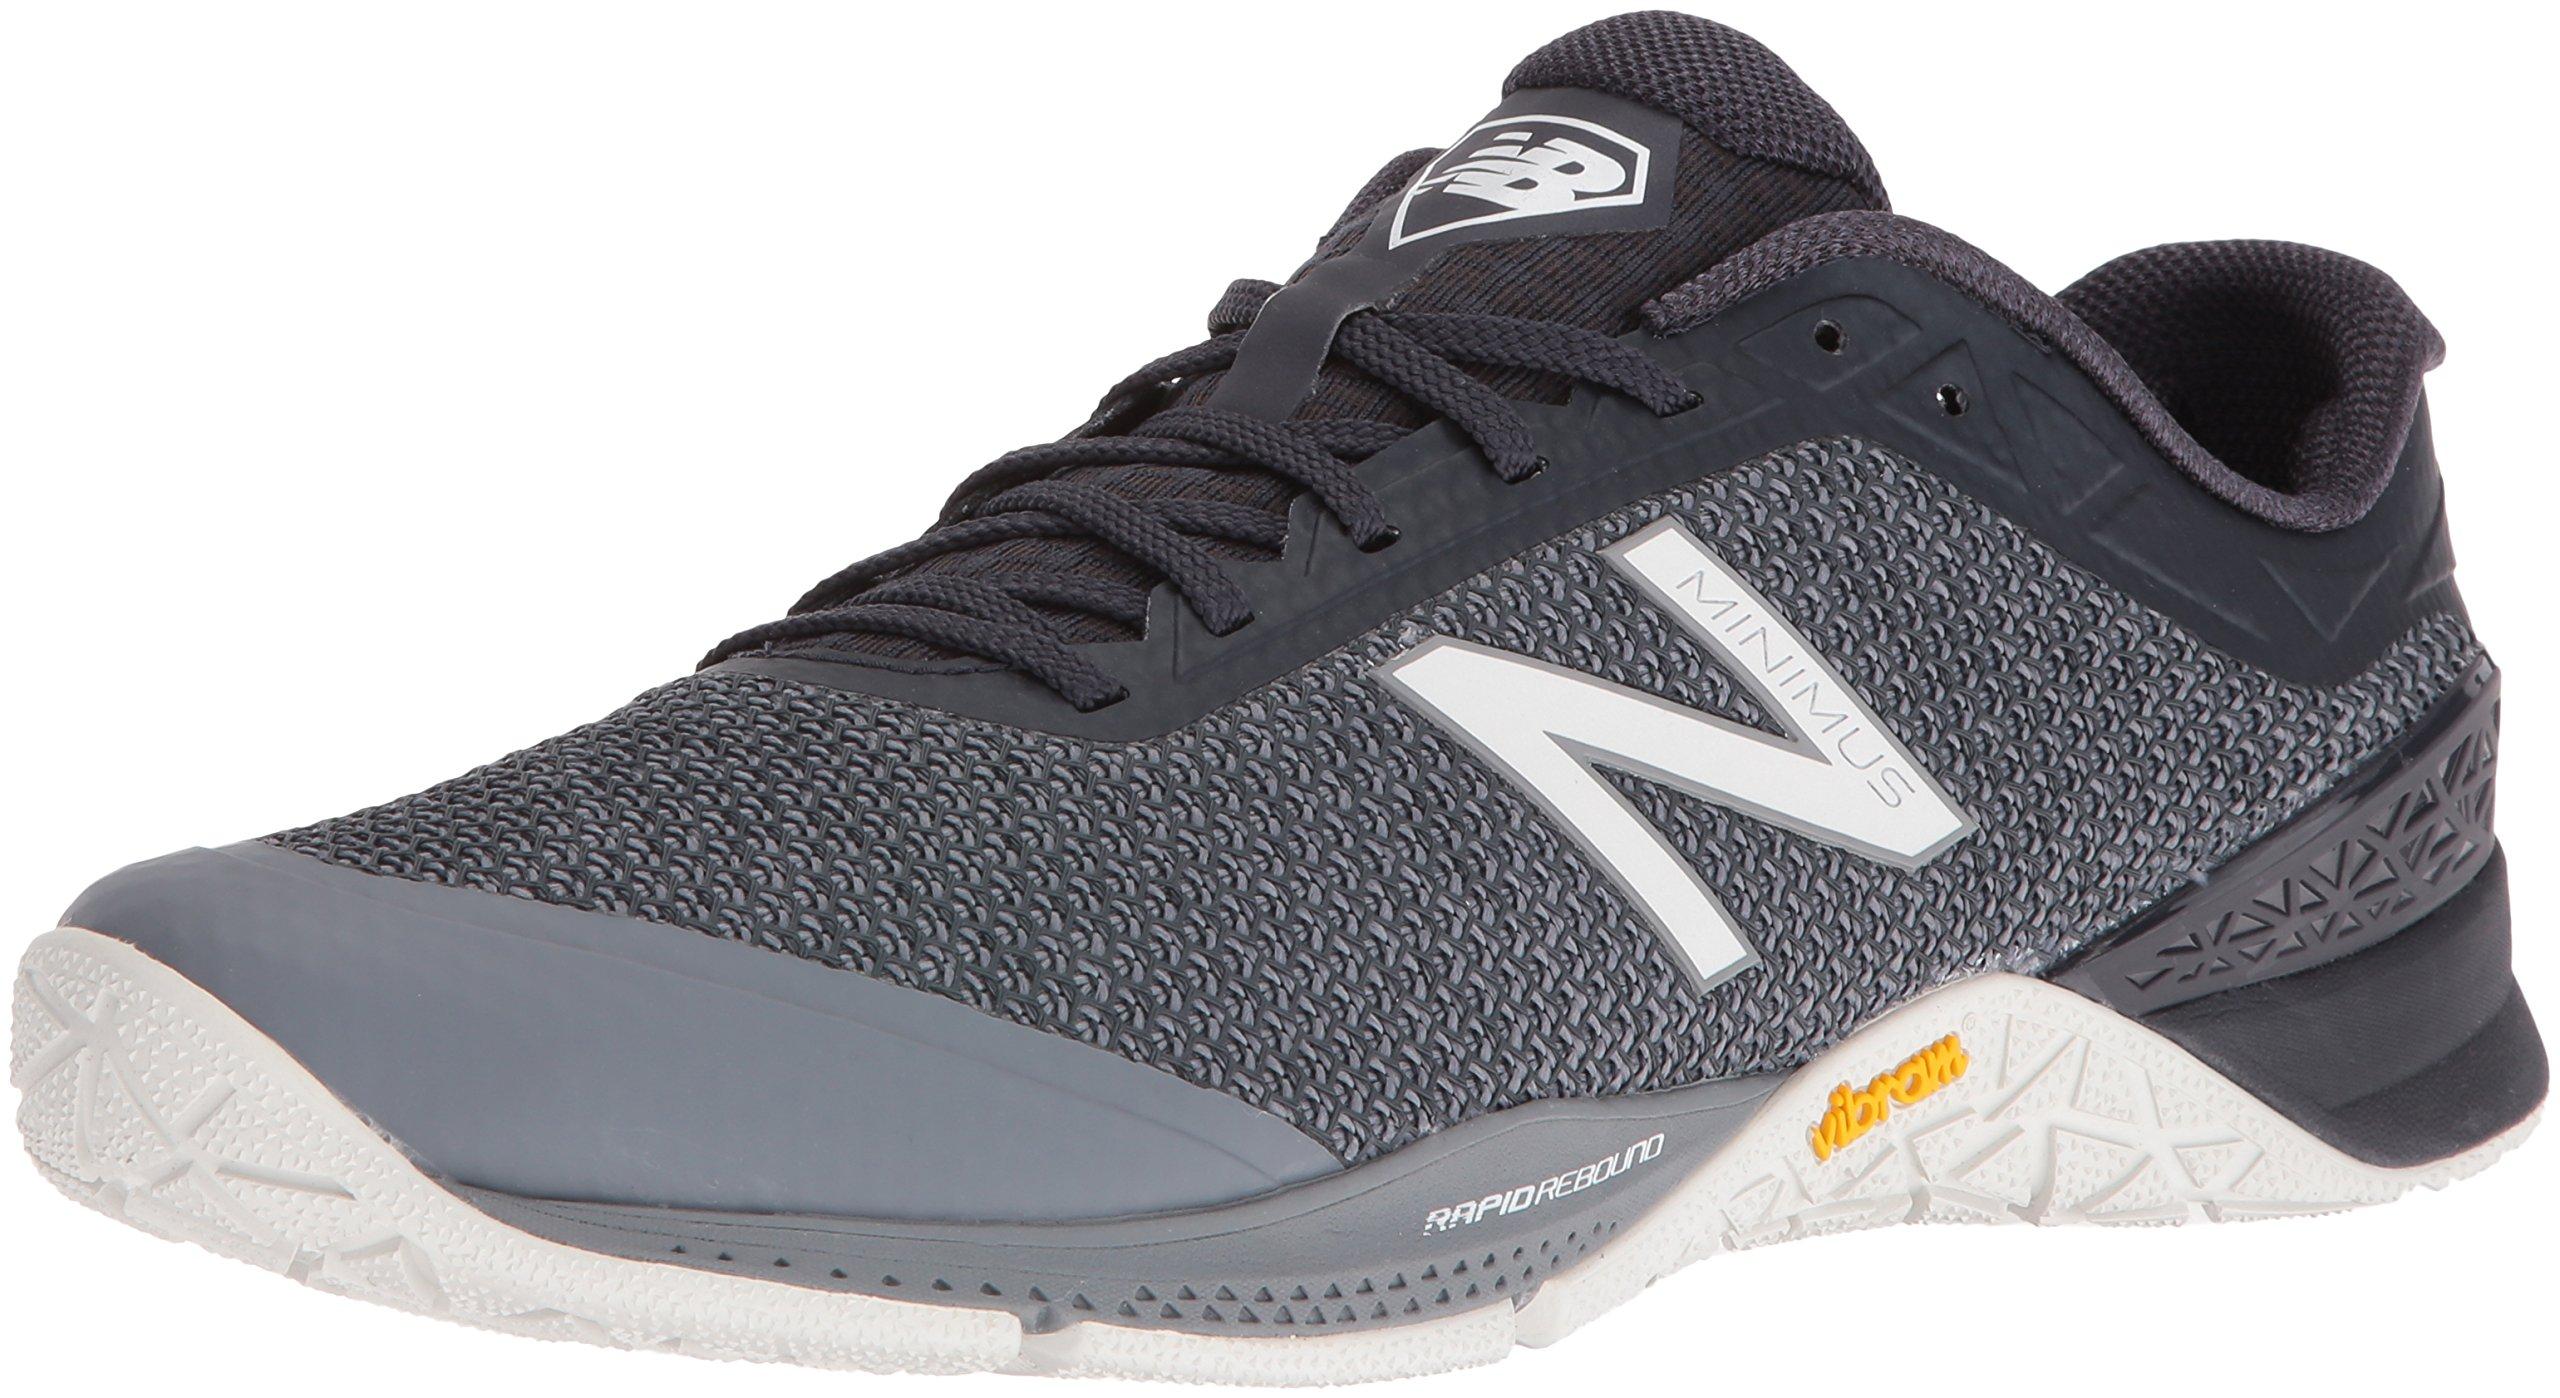 New Balance Men's MX40V1 Gym Workouts Training Shoe, Grey, 10.5 D US by New Balance